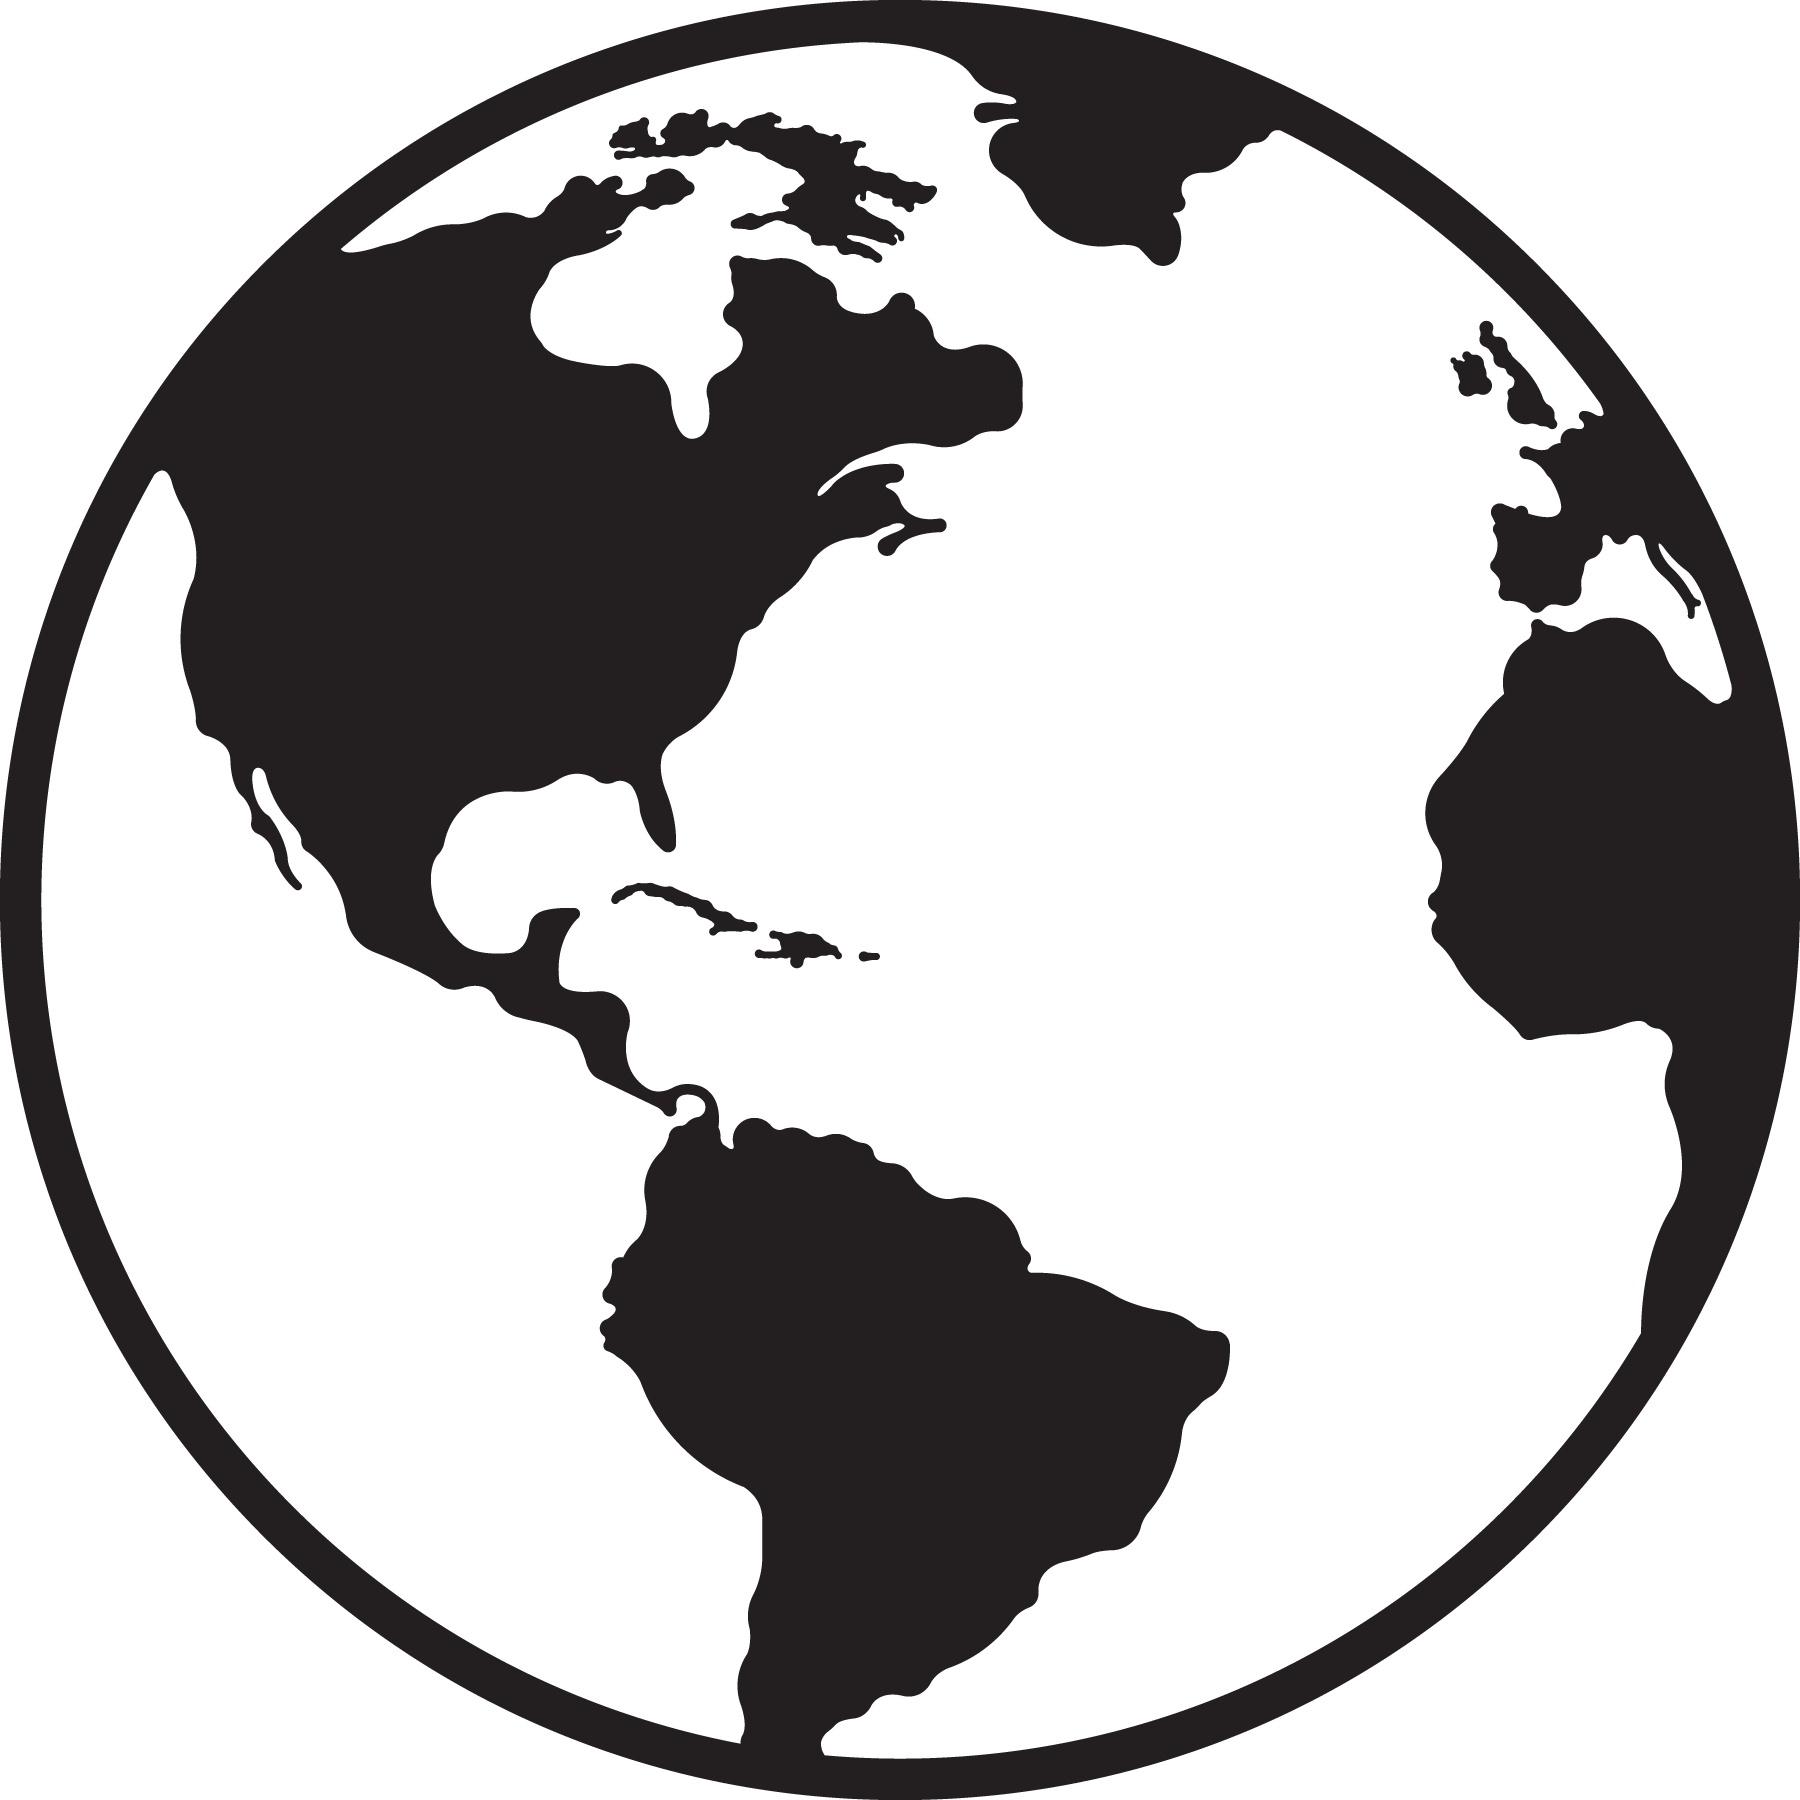 Earth clipart black.